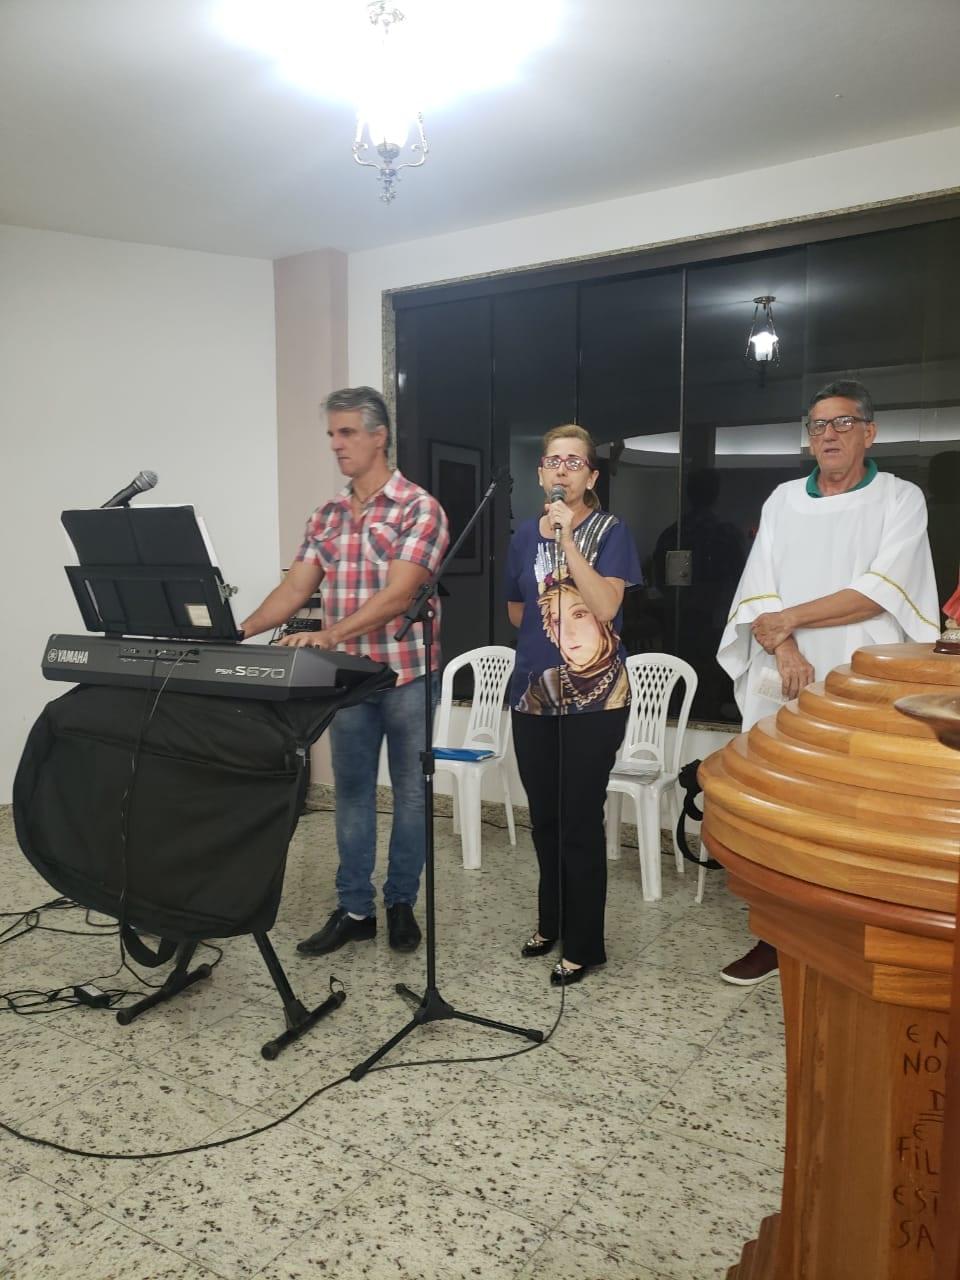 GRUPO DE MÃES DA PARÓQUIA SANTA RITA DE CÁSSIA – ITAPERUNA/RJ